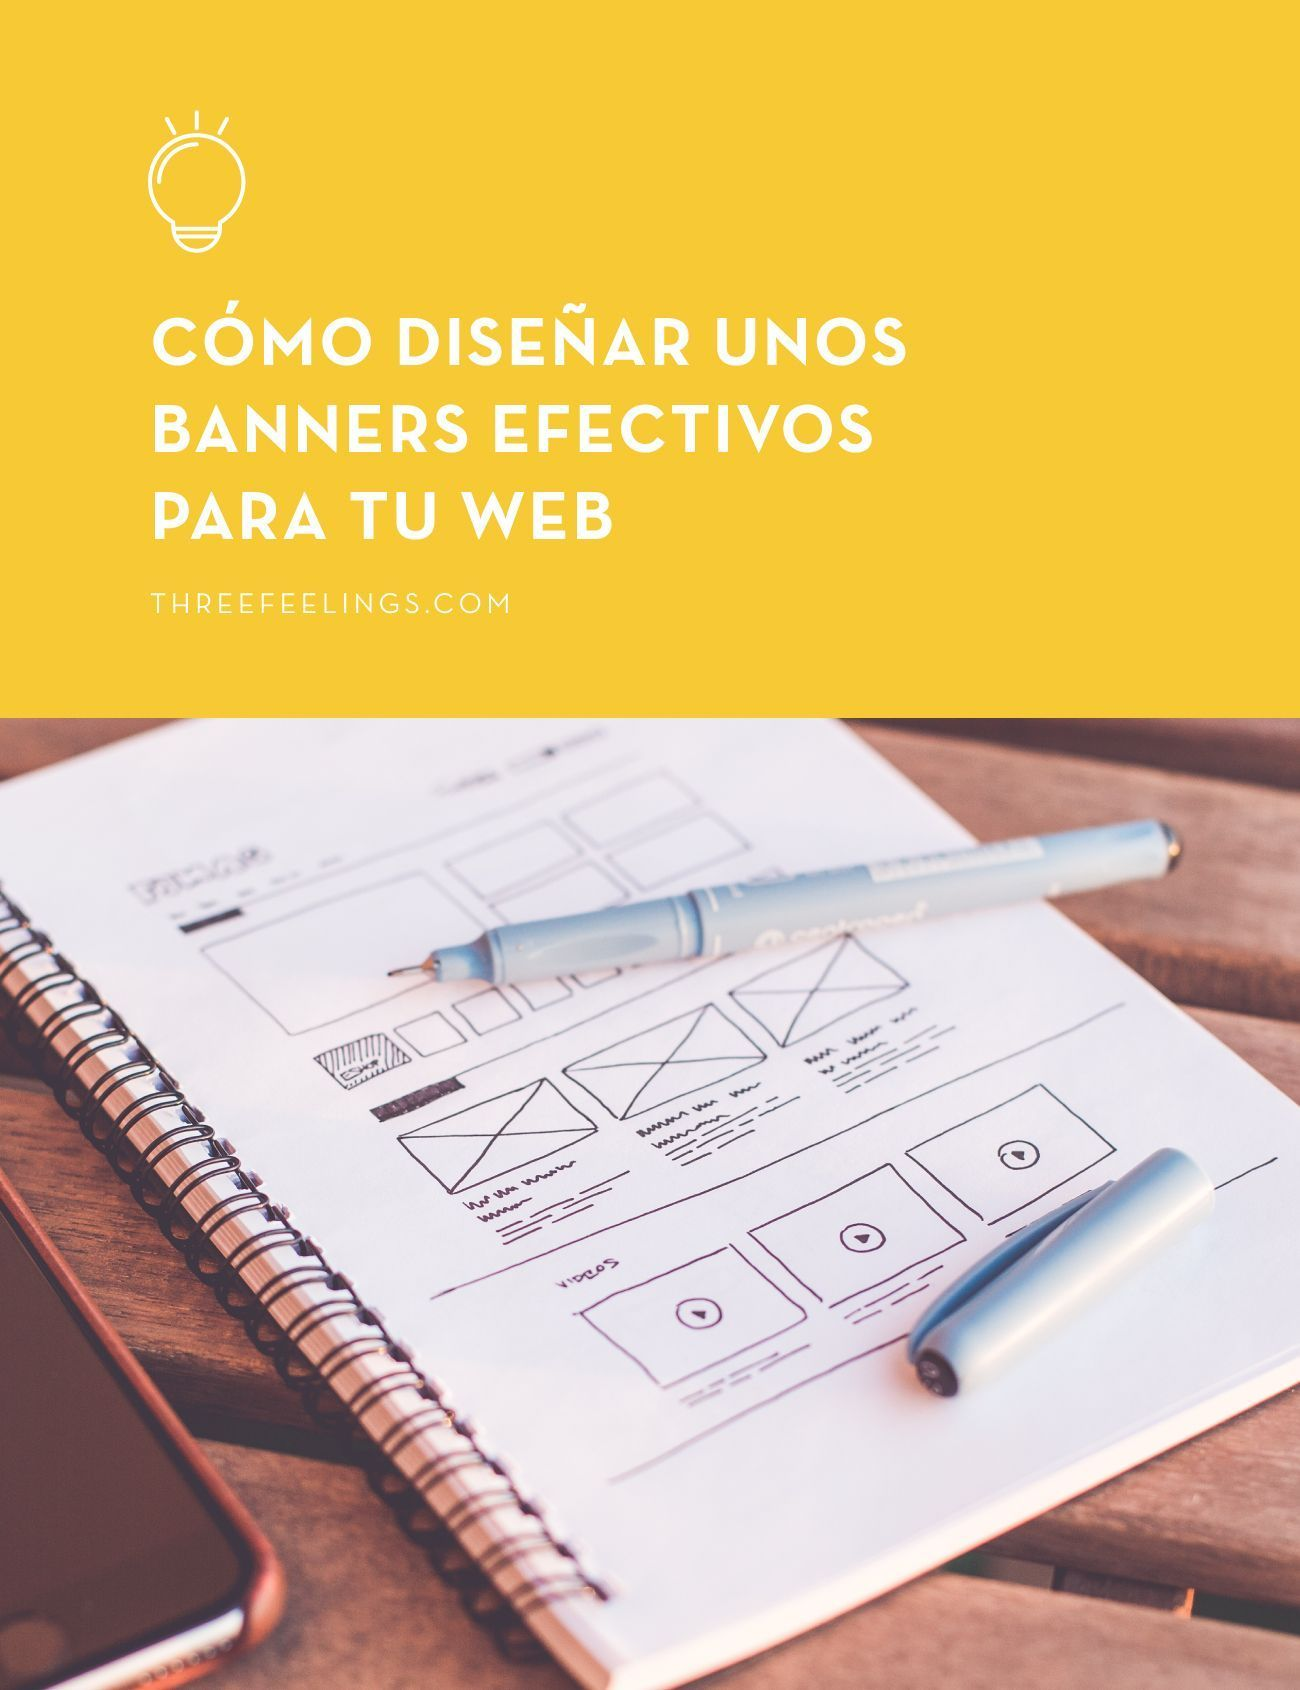 trucos-para-disenar-banners-efectivos-web-threefeelings-00